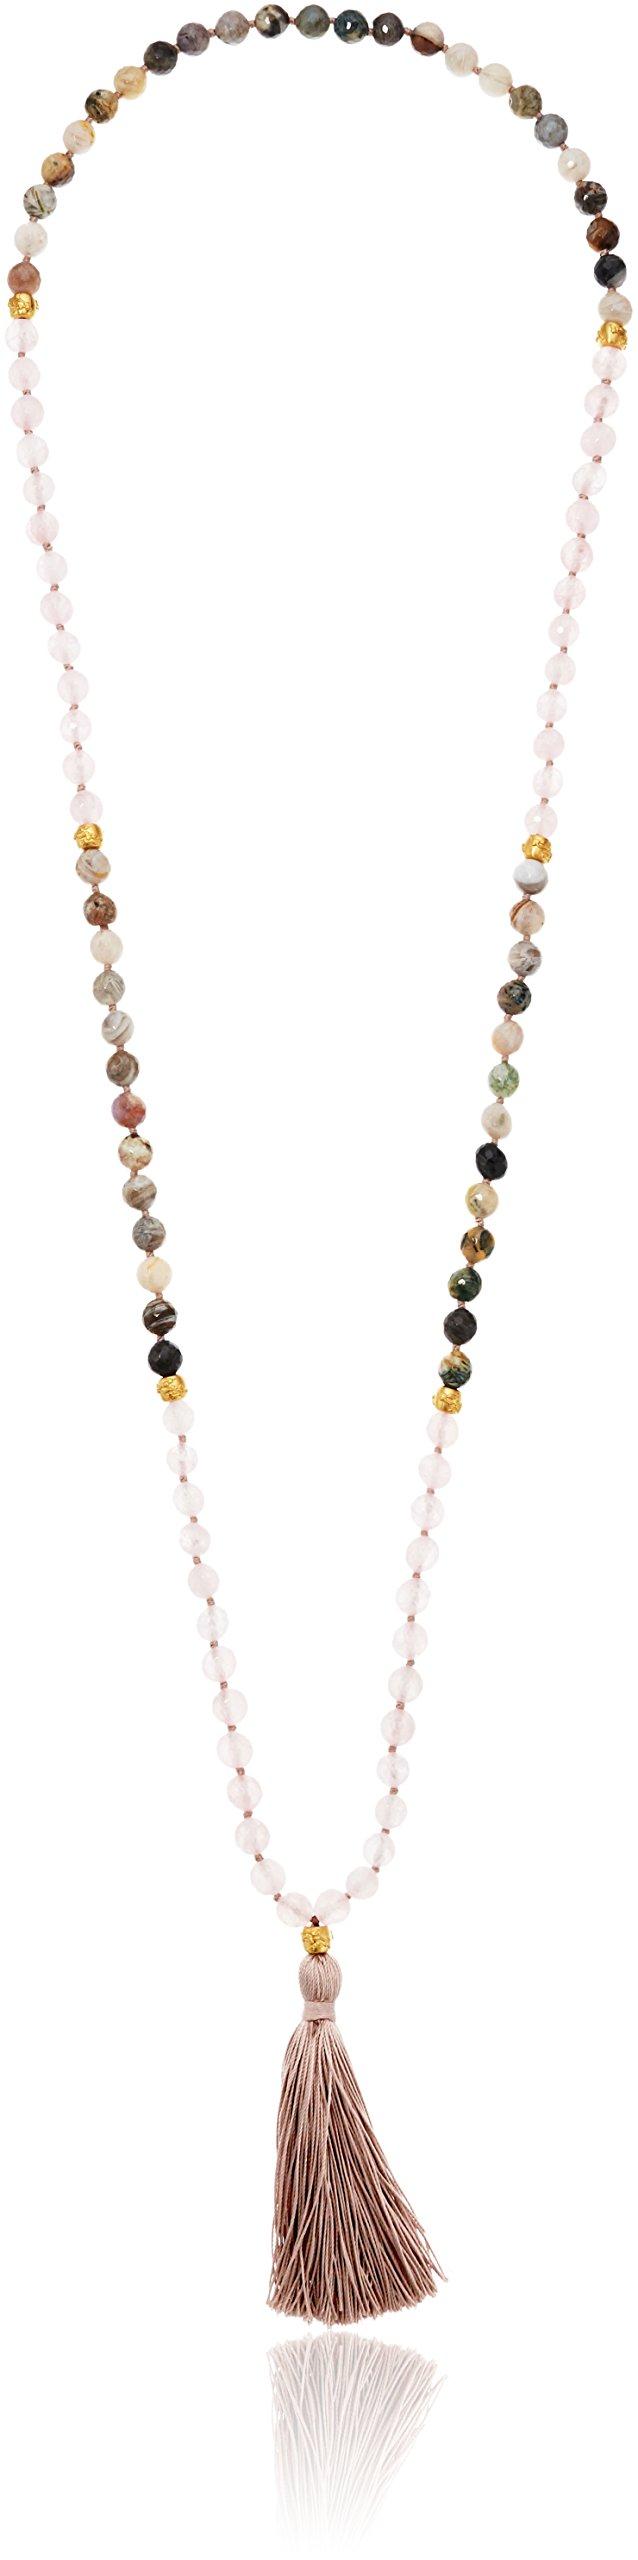 Satya Jewelry Rose Quartz & Agate Gold Plated Cherry Blossom Mala Tassel Strand Necklace